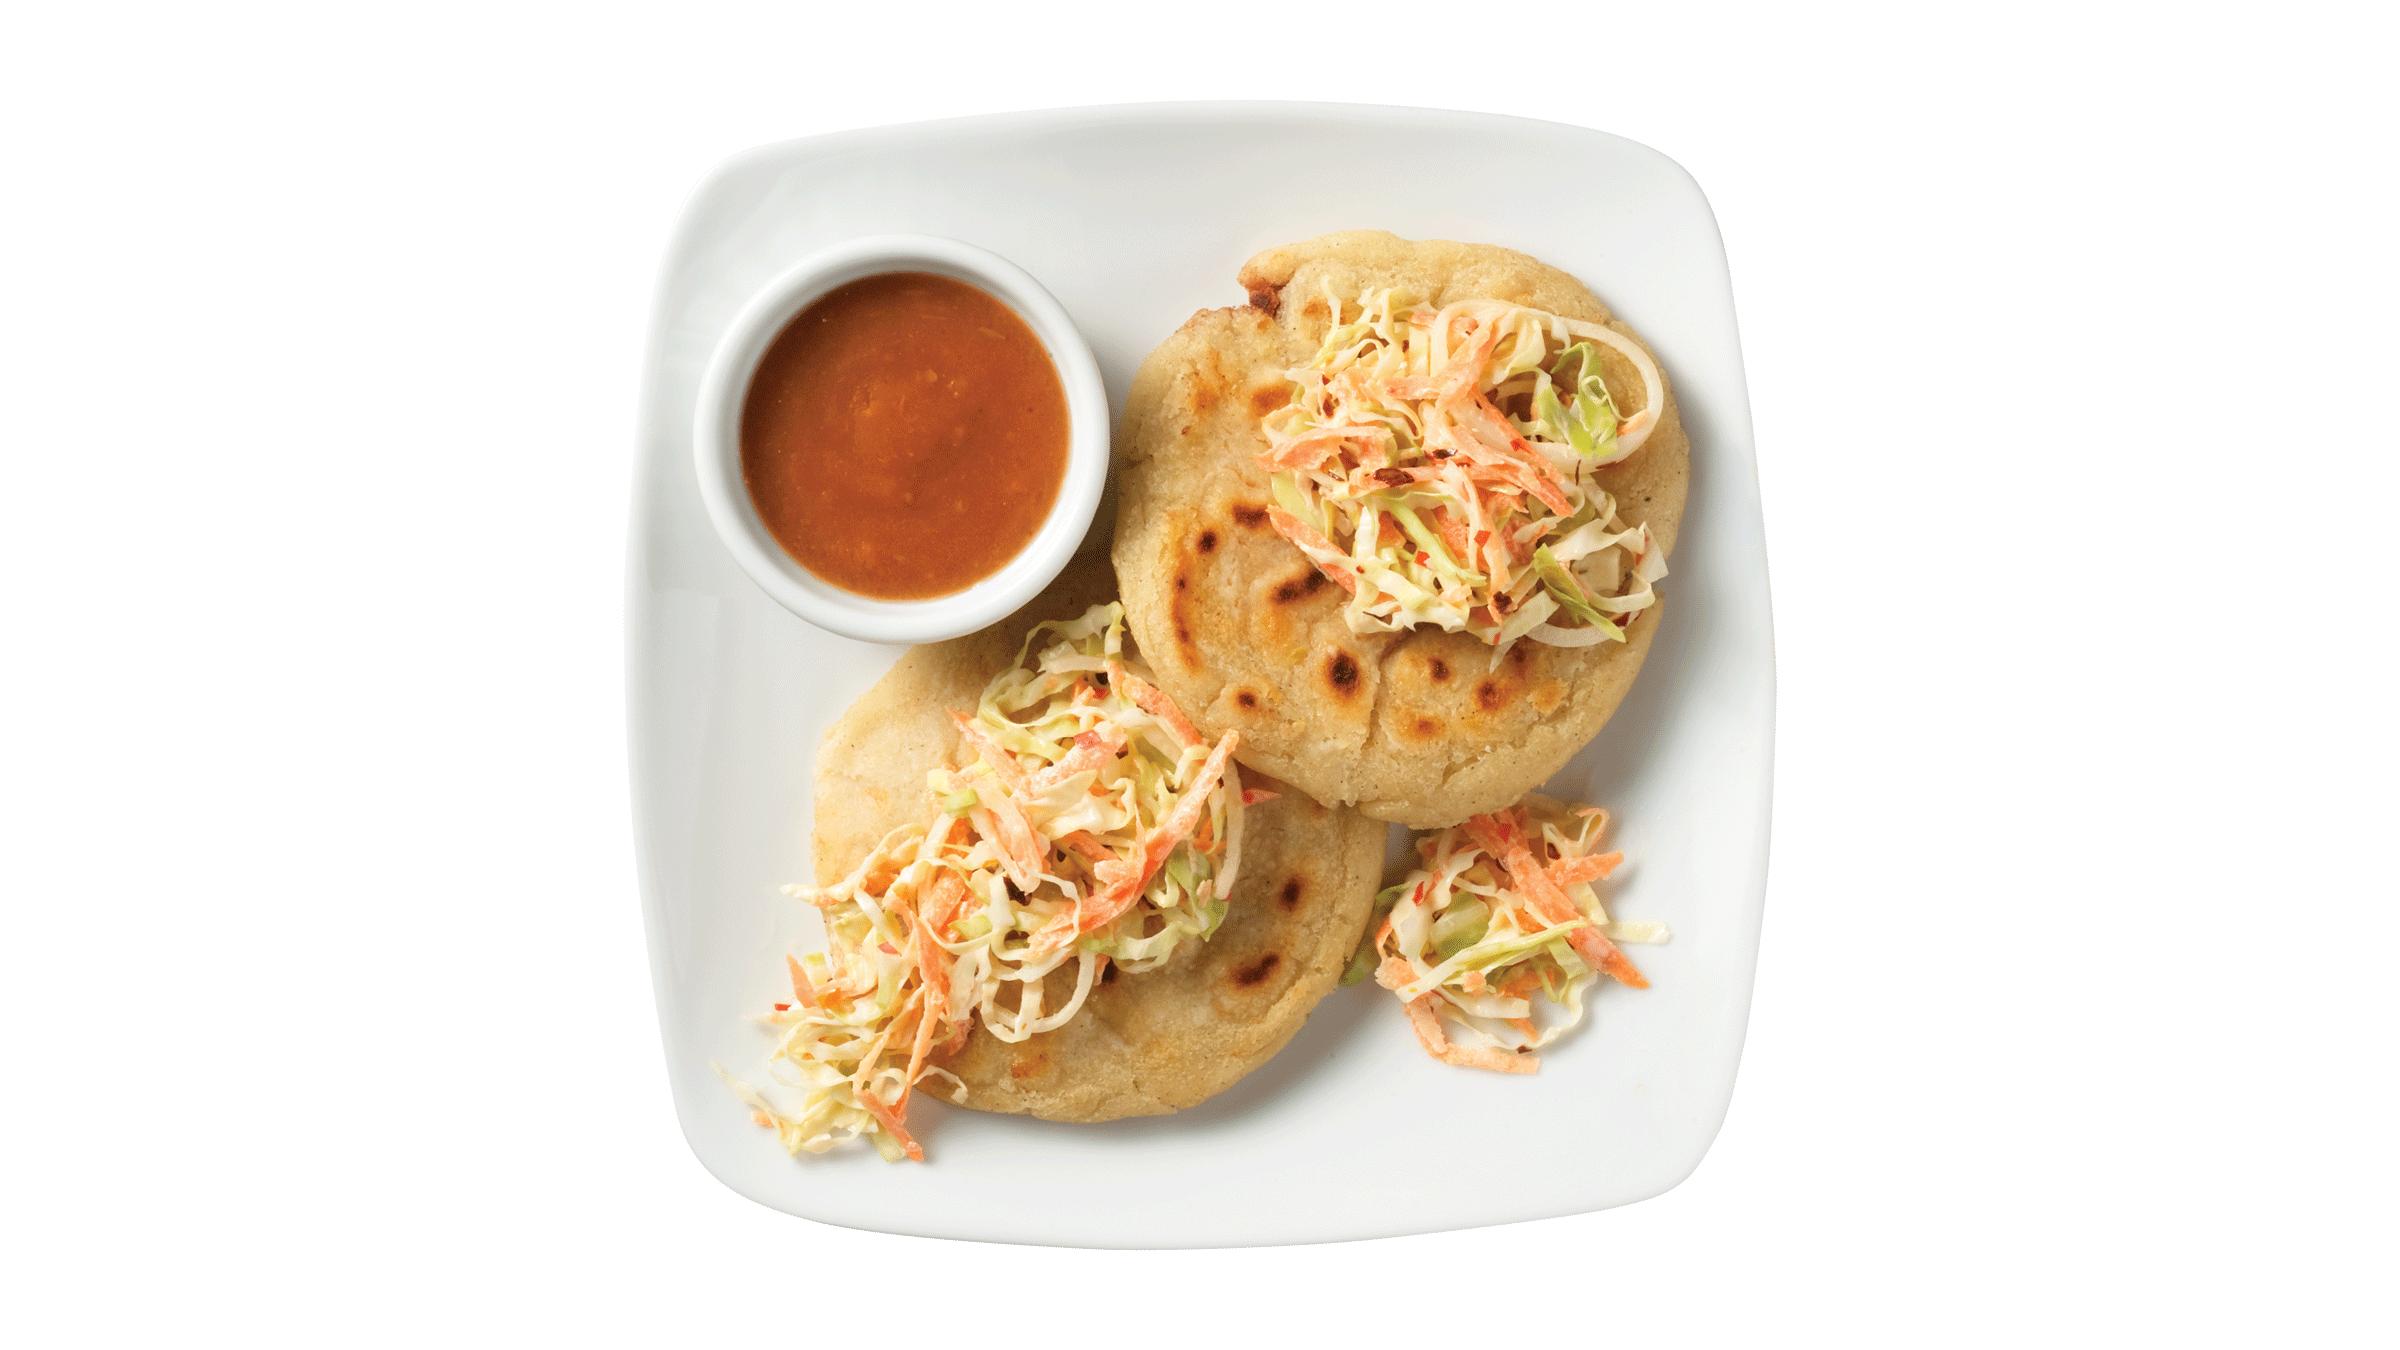 Salvadorean Pupusas (Stuffed Masa Cakes)